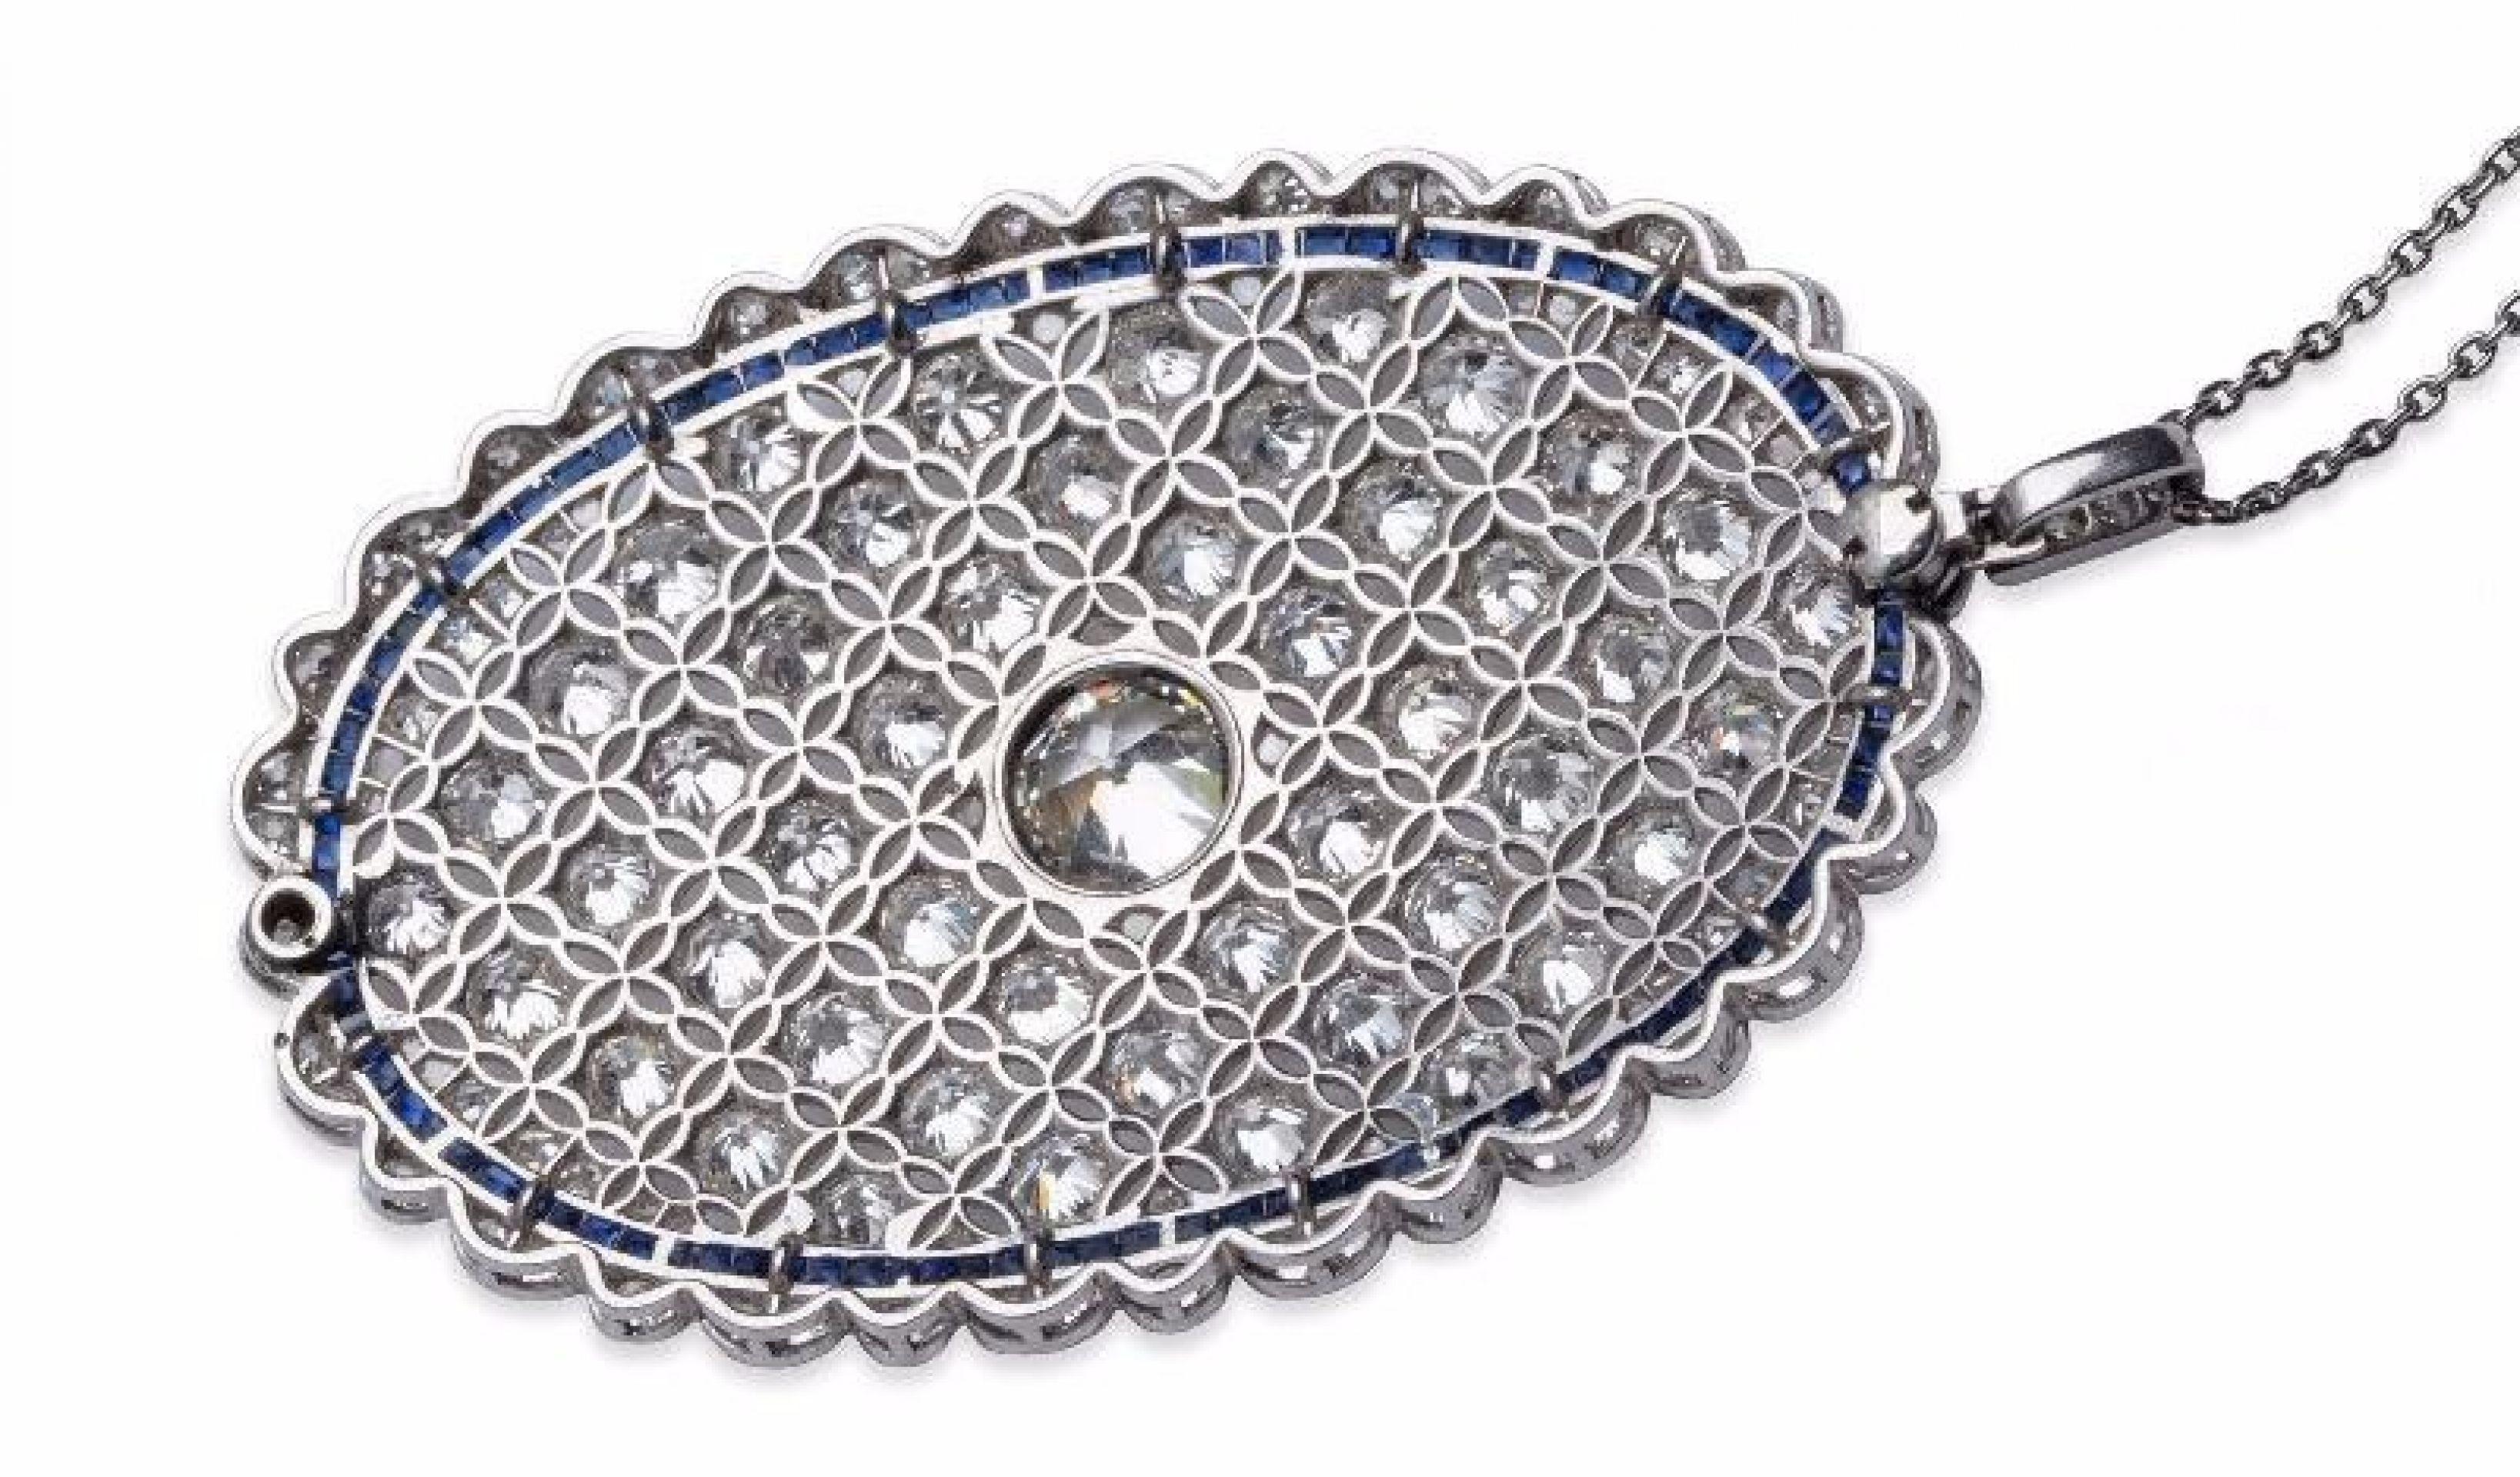 Antique Old European Cut Diamond and Sapphire Filigree Pendant